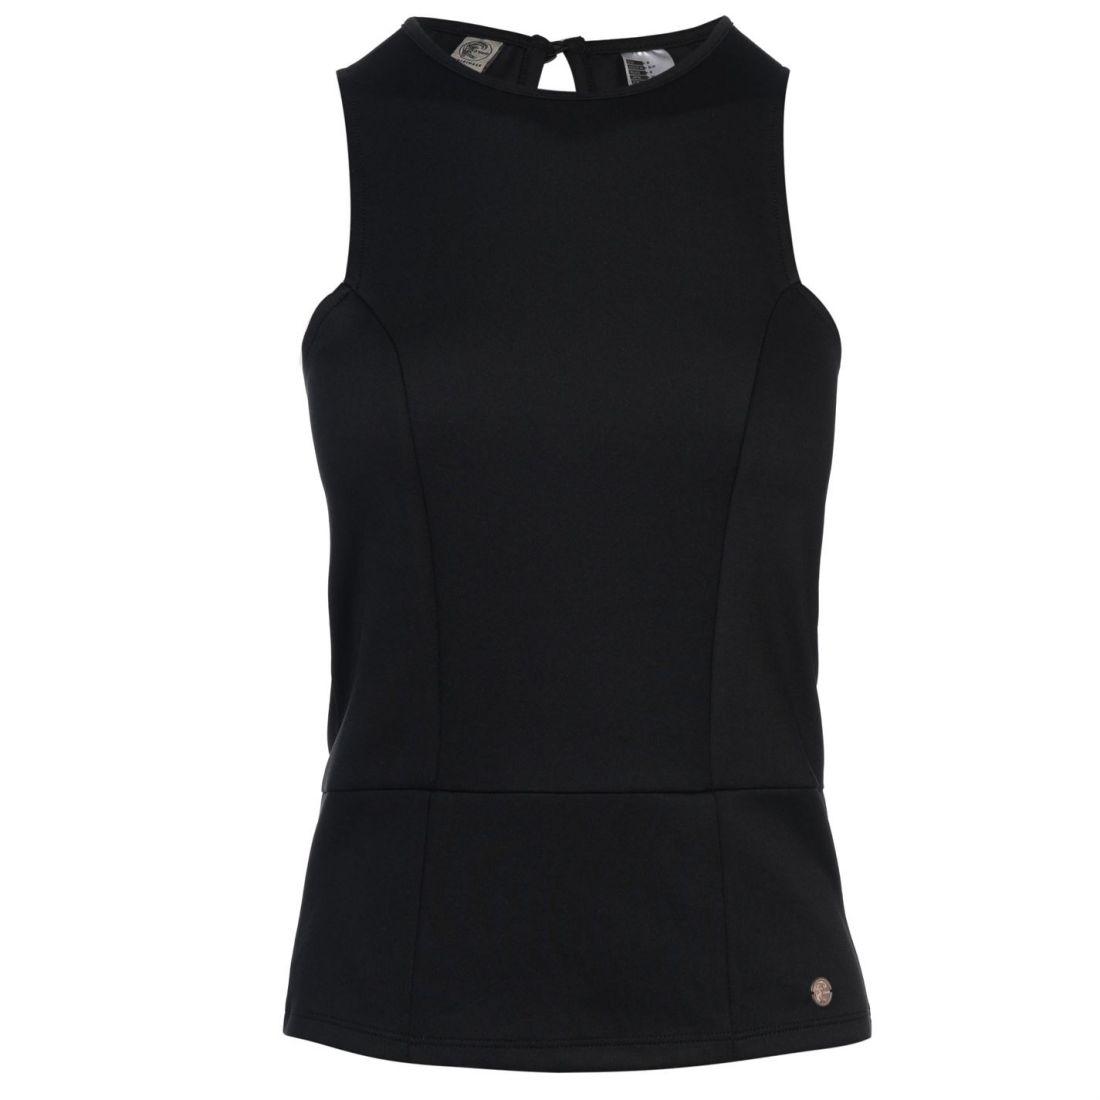 Oneill Neo Camiseta sin mangas señoras Chaleco Sin Mangas Tramo Cuello Redondo